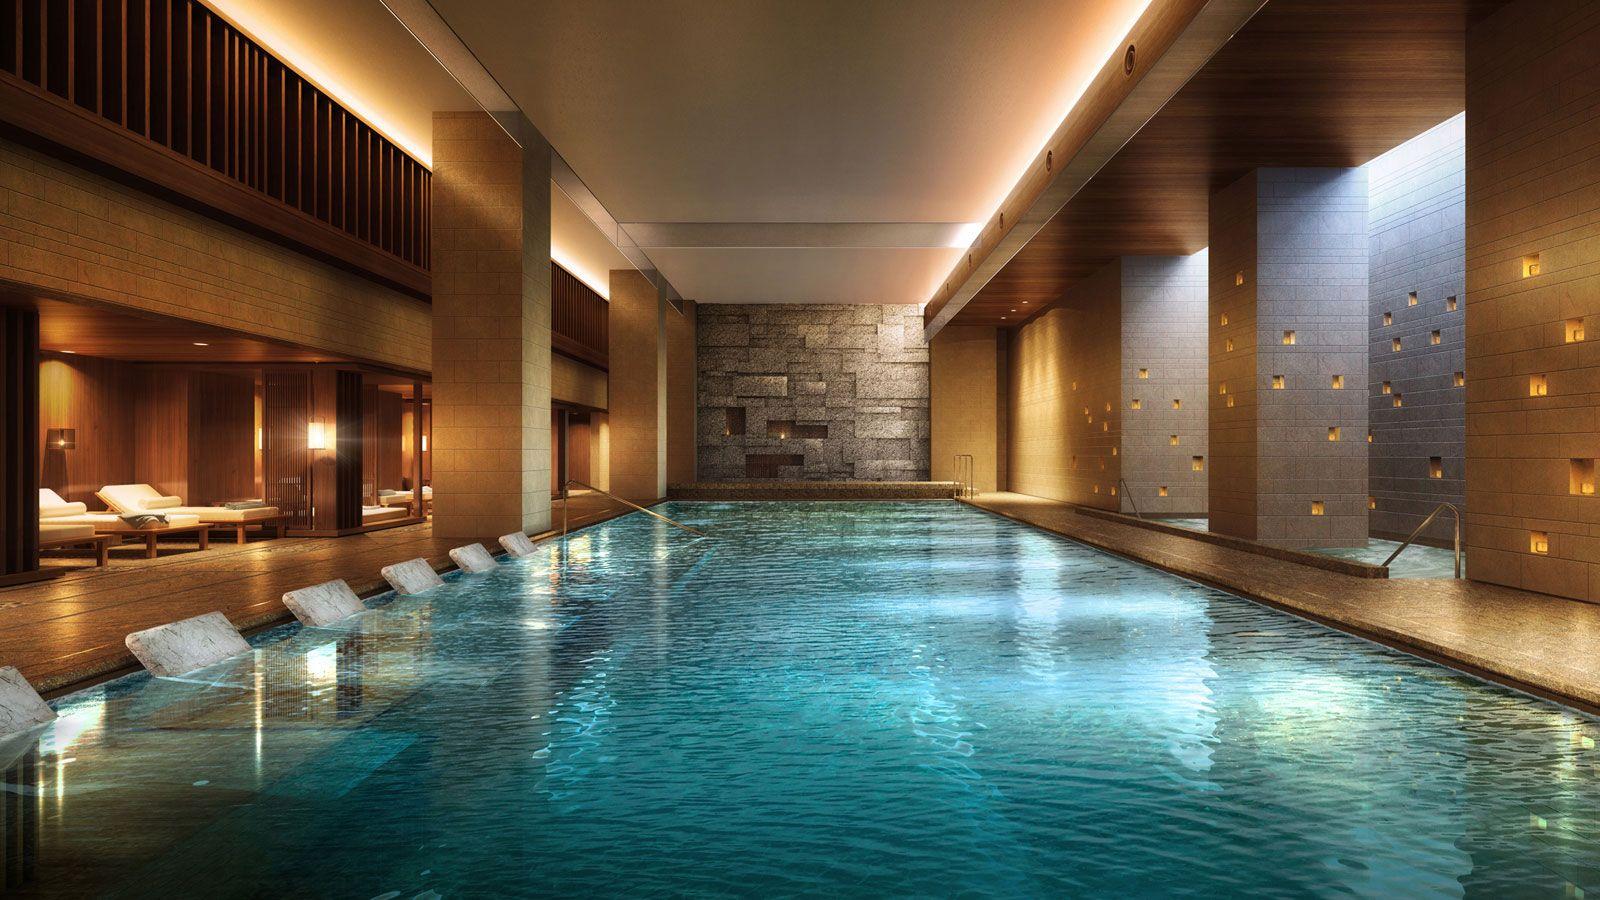 Four Seasons Hotel Kyoto 7 Pools Pinterest Spa Four Seasons